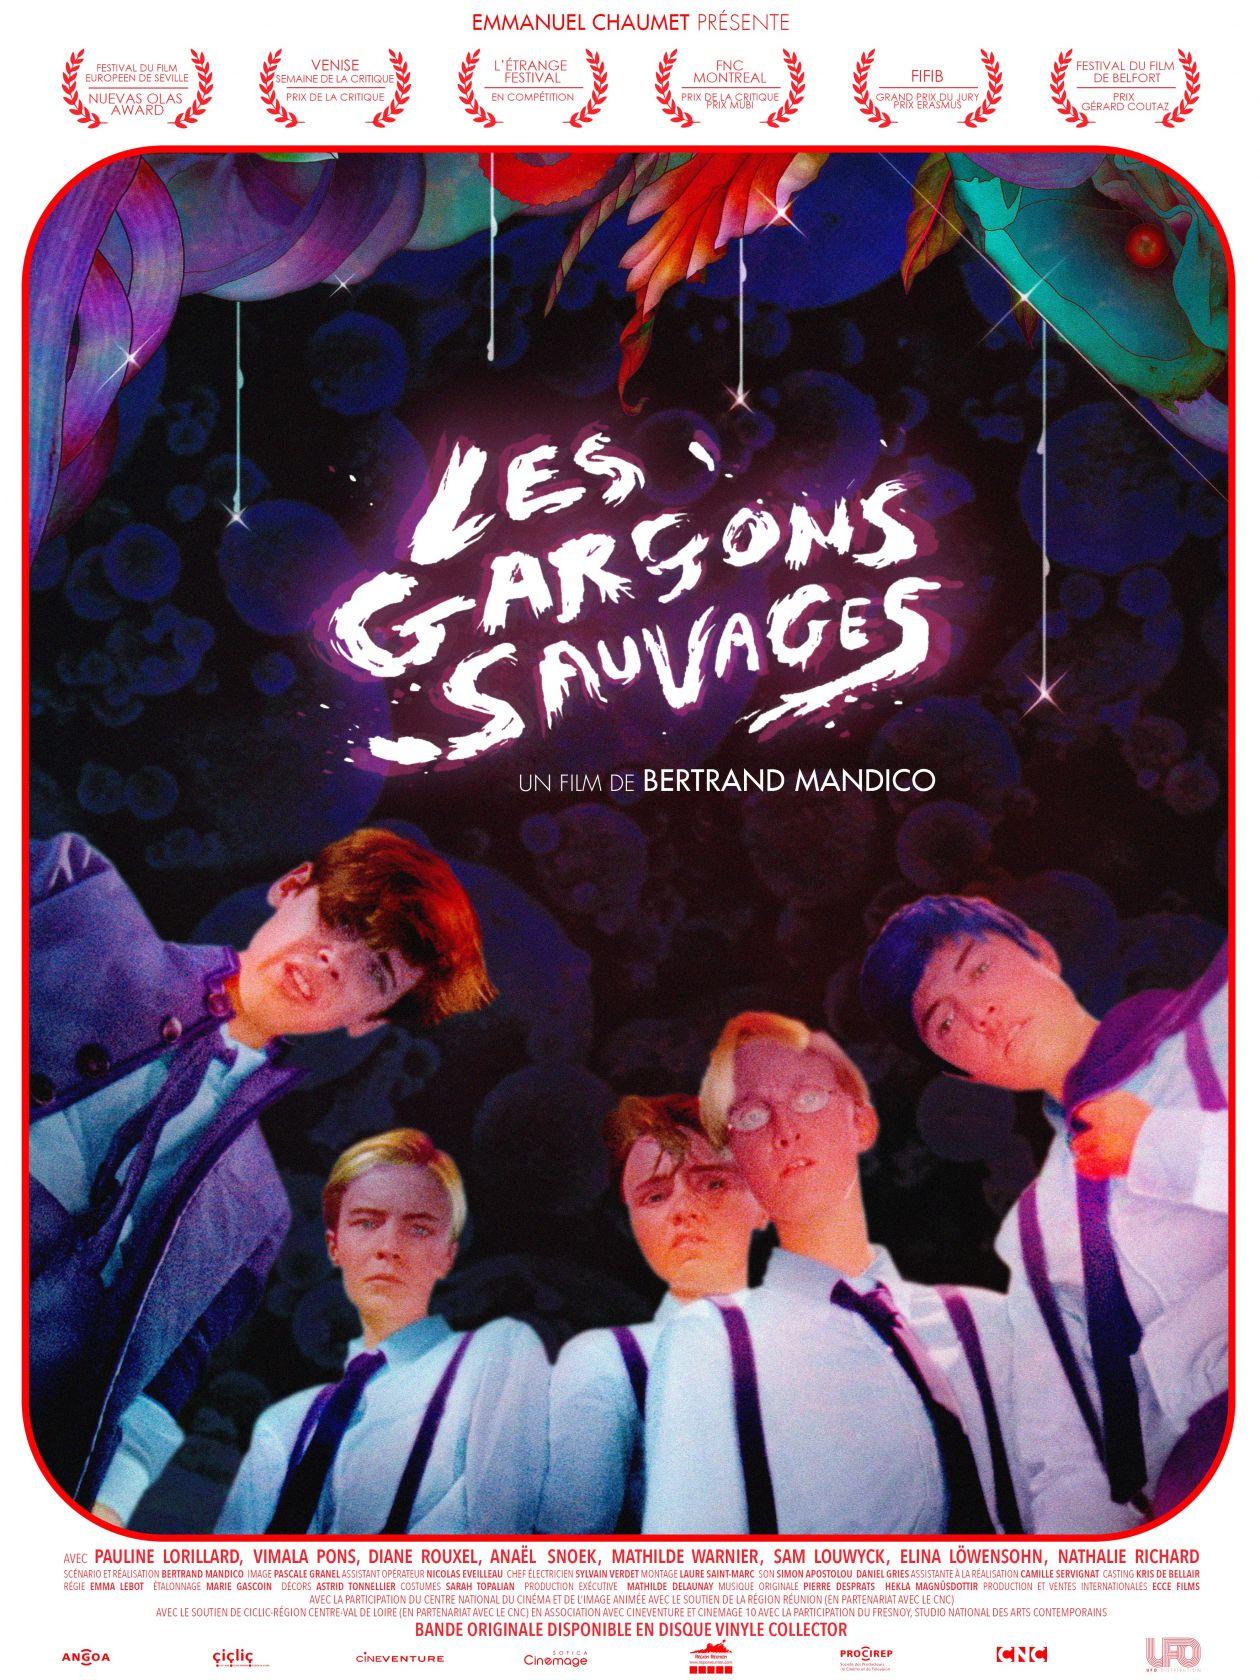 Les Garçons sauvages / The Wild Boys | Bertrand Mandico /  Pauline Lorillard, Vimala Pons, Diane Rouxel, Anaël Snoek, Mathilde Warnier actresses / 2018 Movie Poster / Affiche film